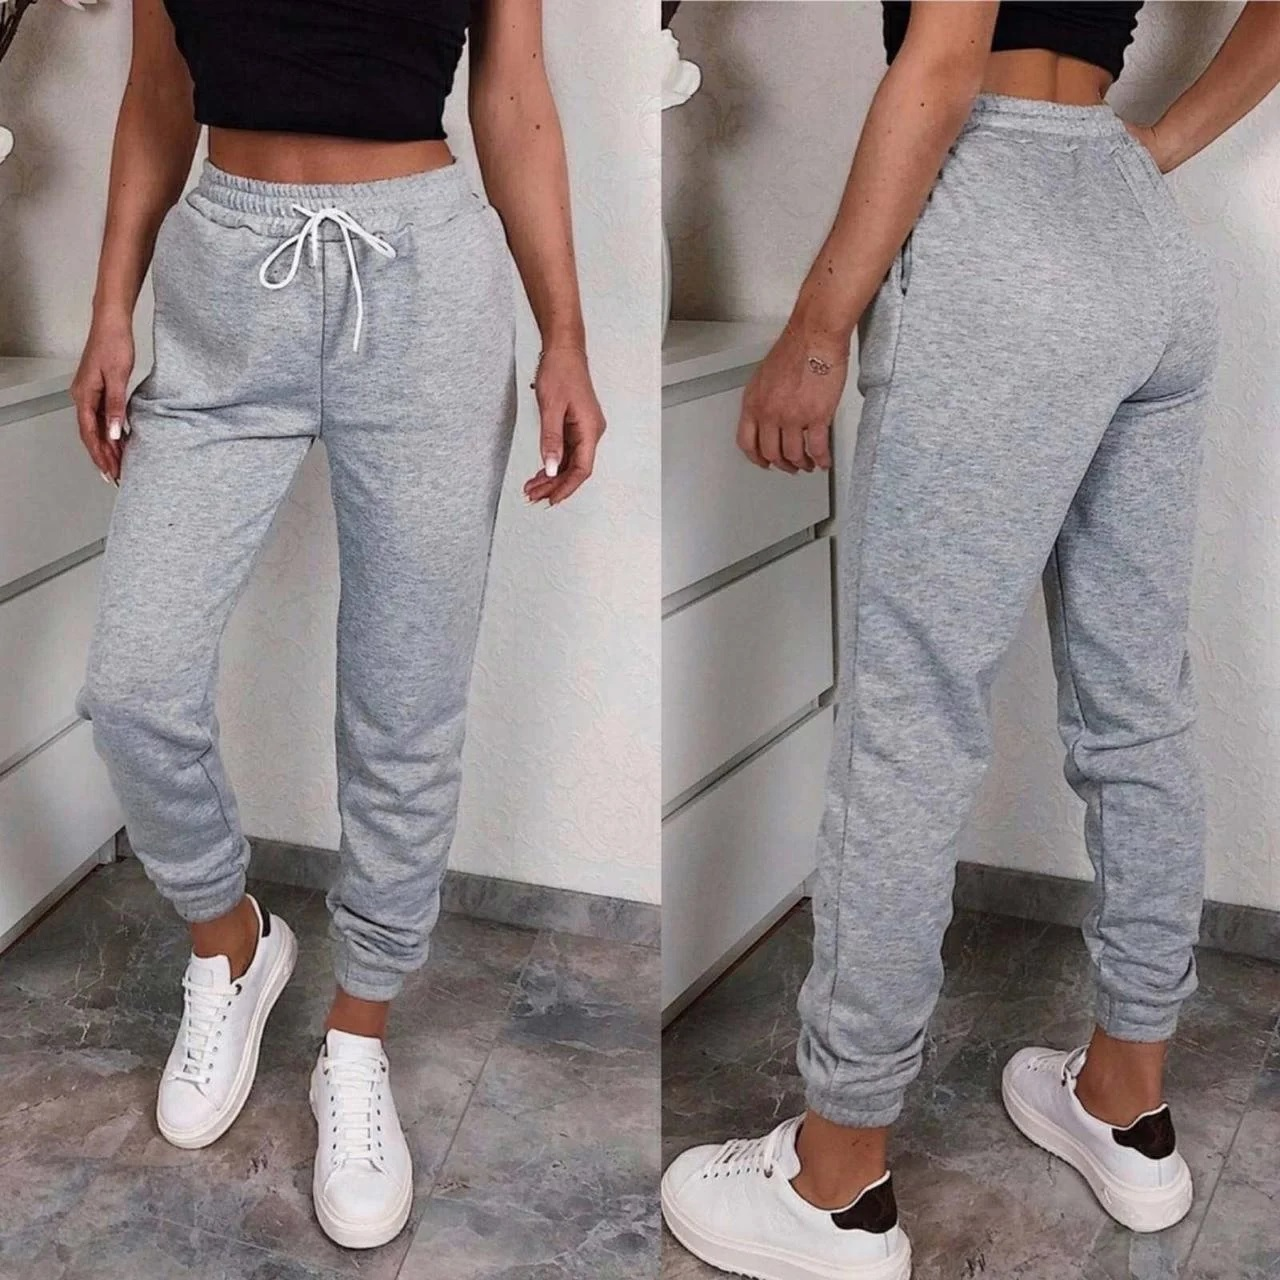 теплые штаны, повседневные штаны